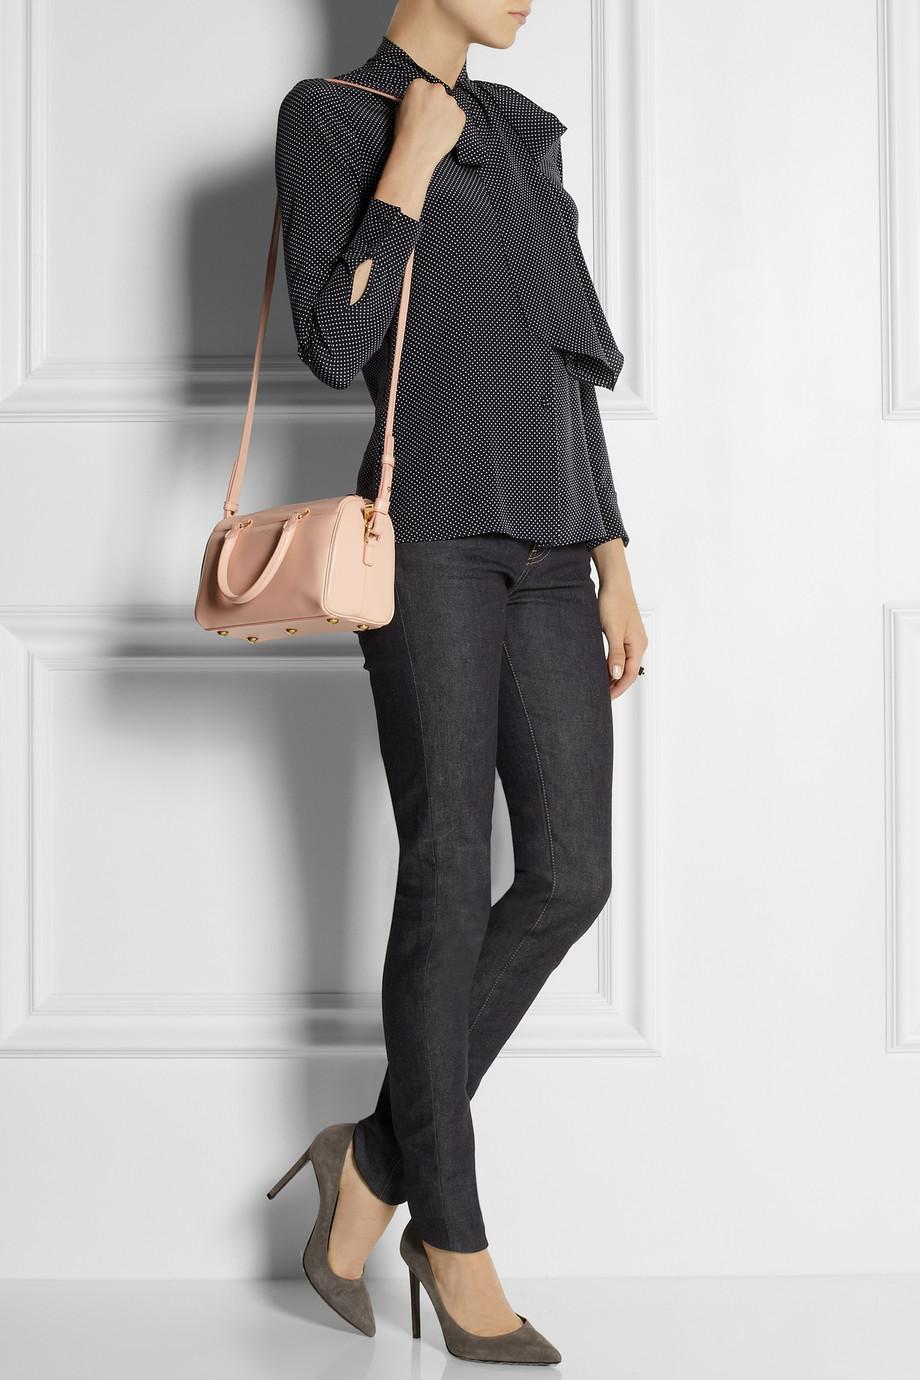 b6cb4073064 Saint Laurent Classic Duffle 3 Leather Bag in Pink - Lyst